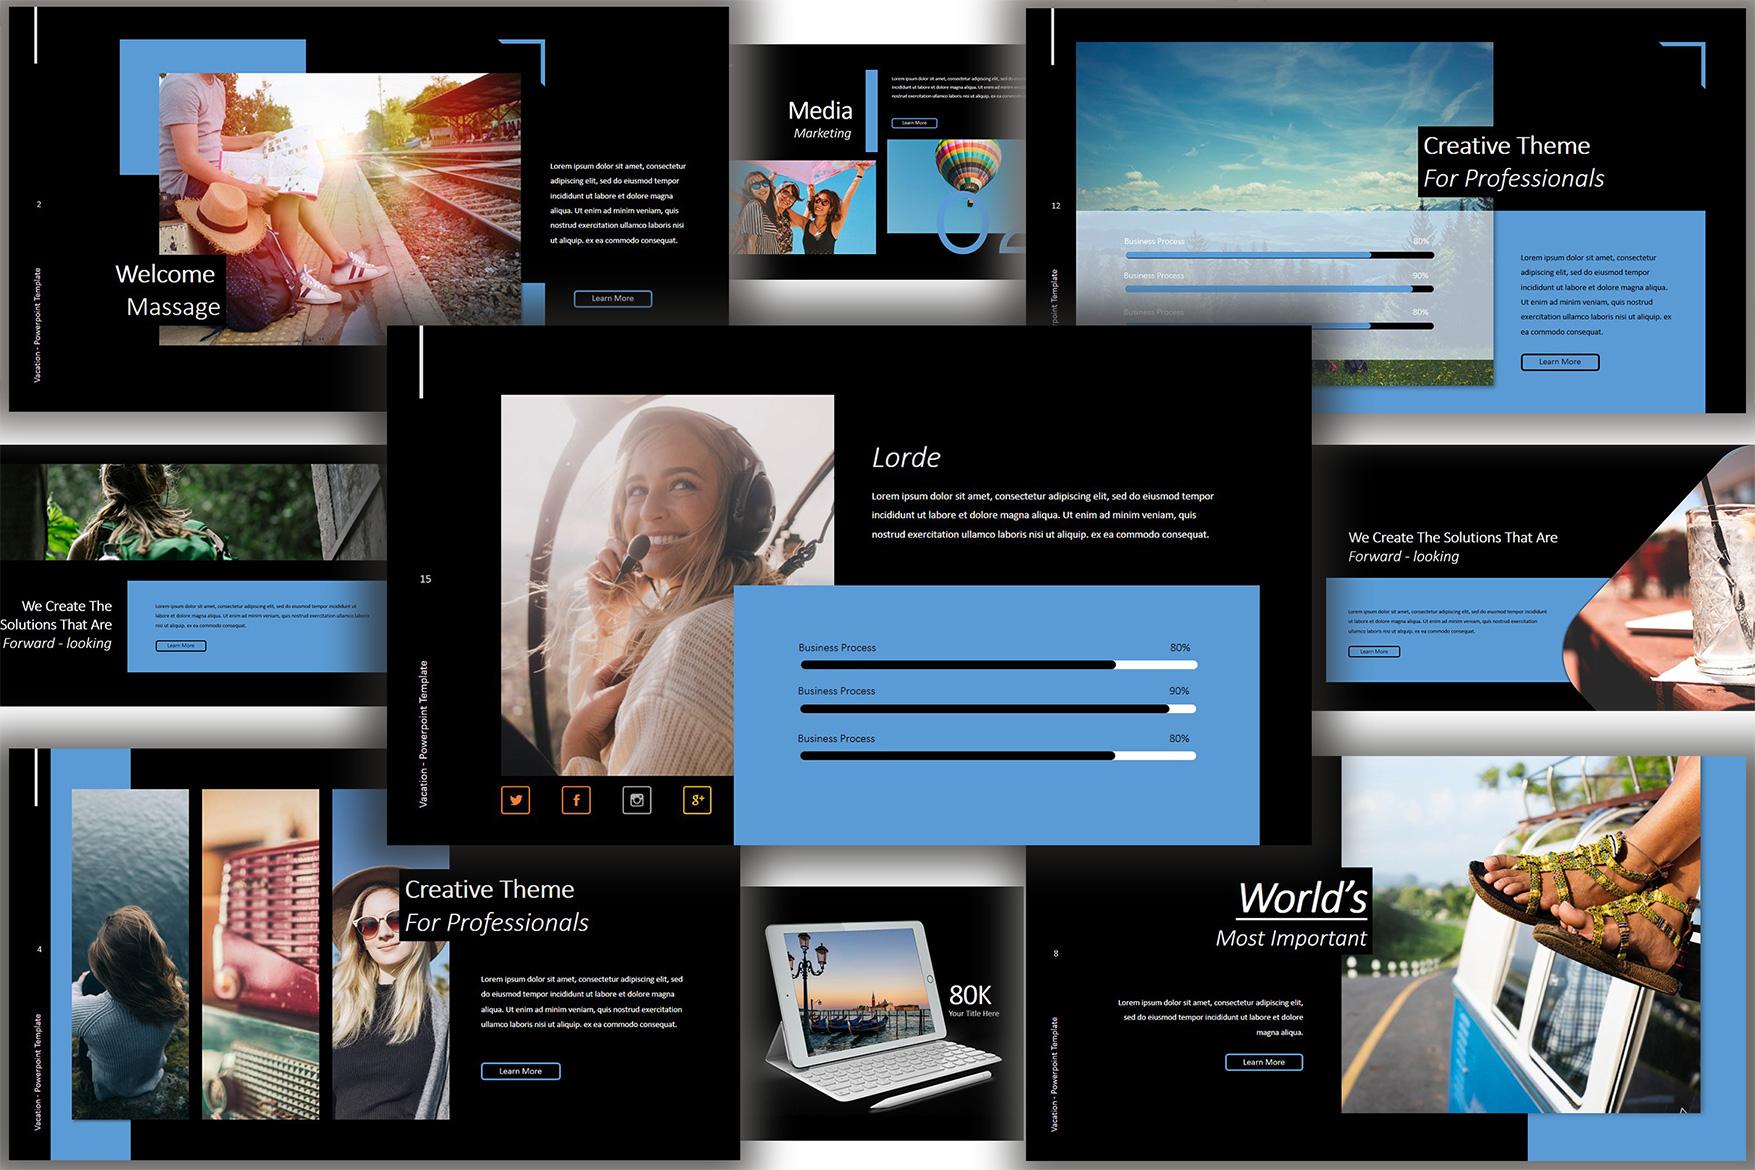 Vacation Lookbook Dark Google Slides Presentation example image 4